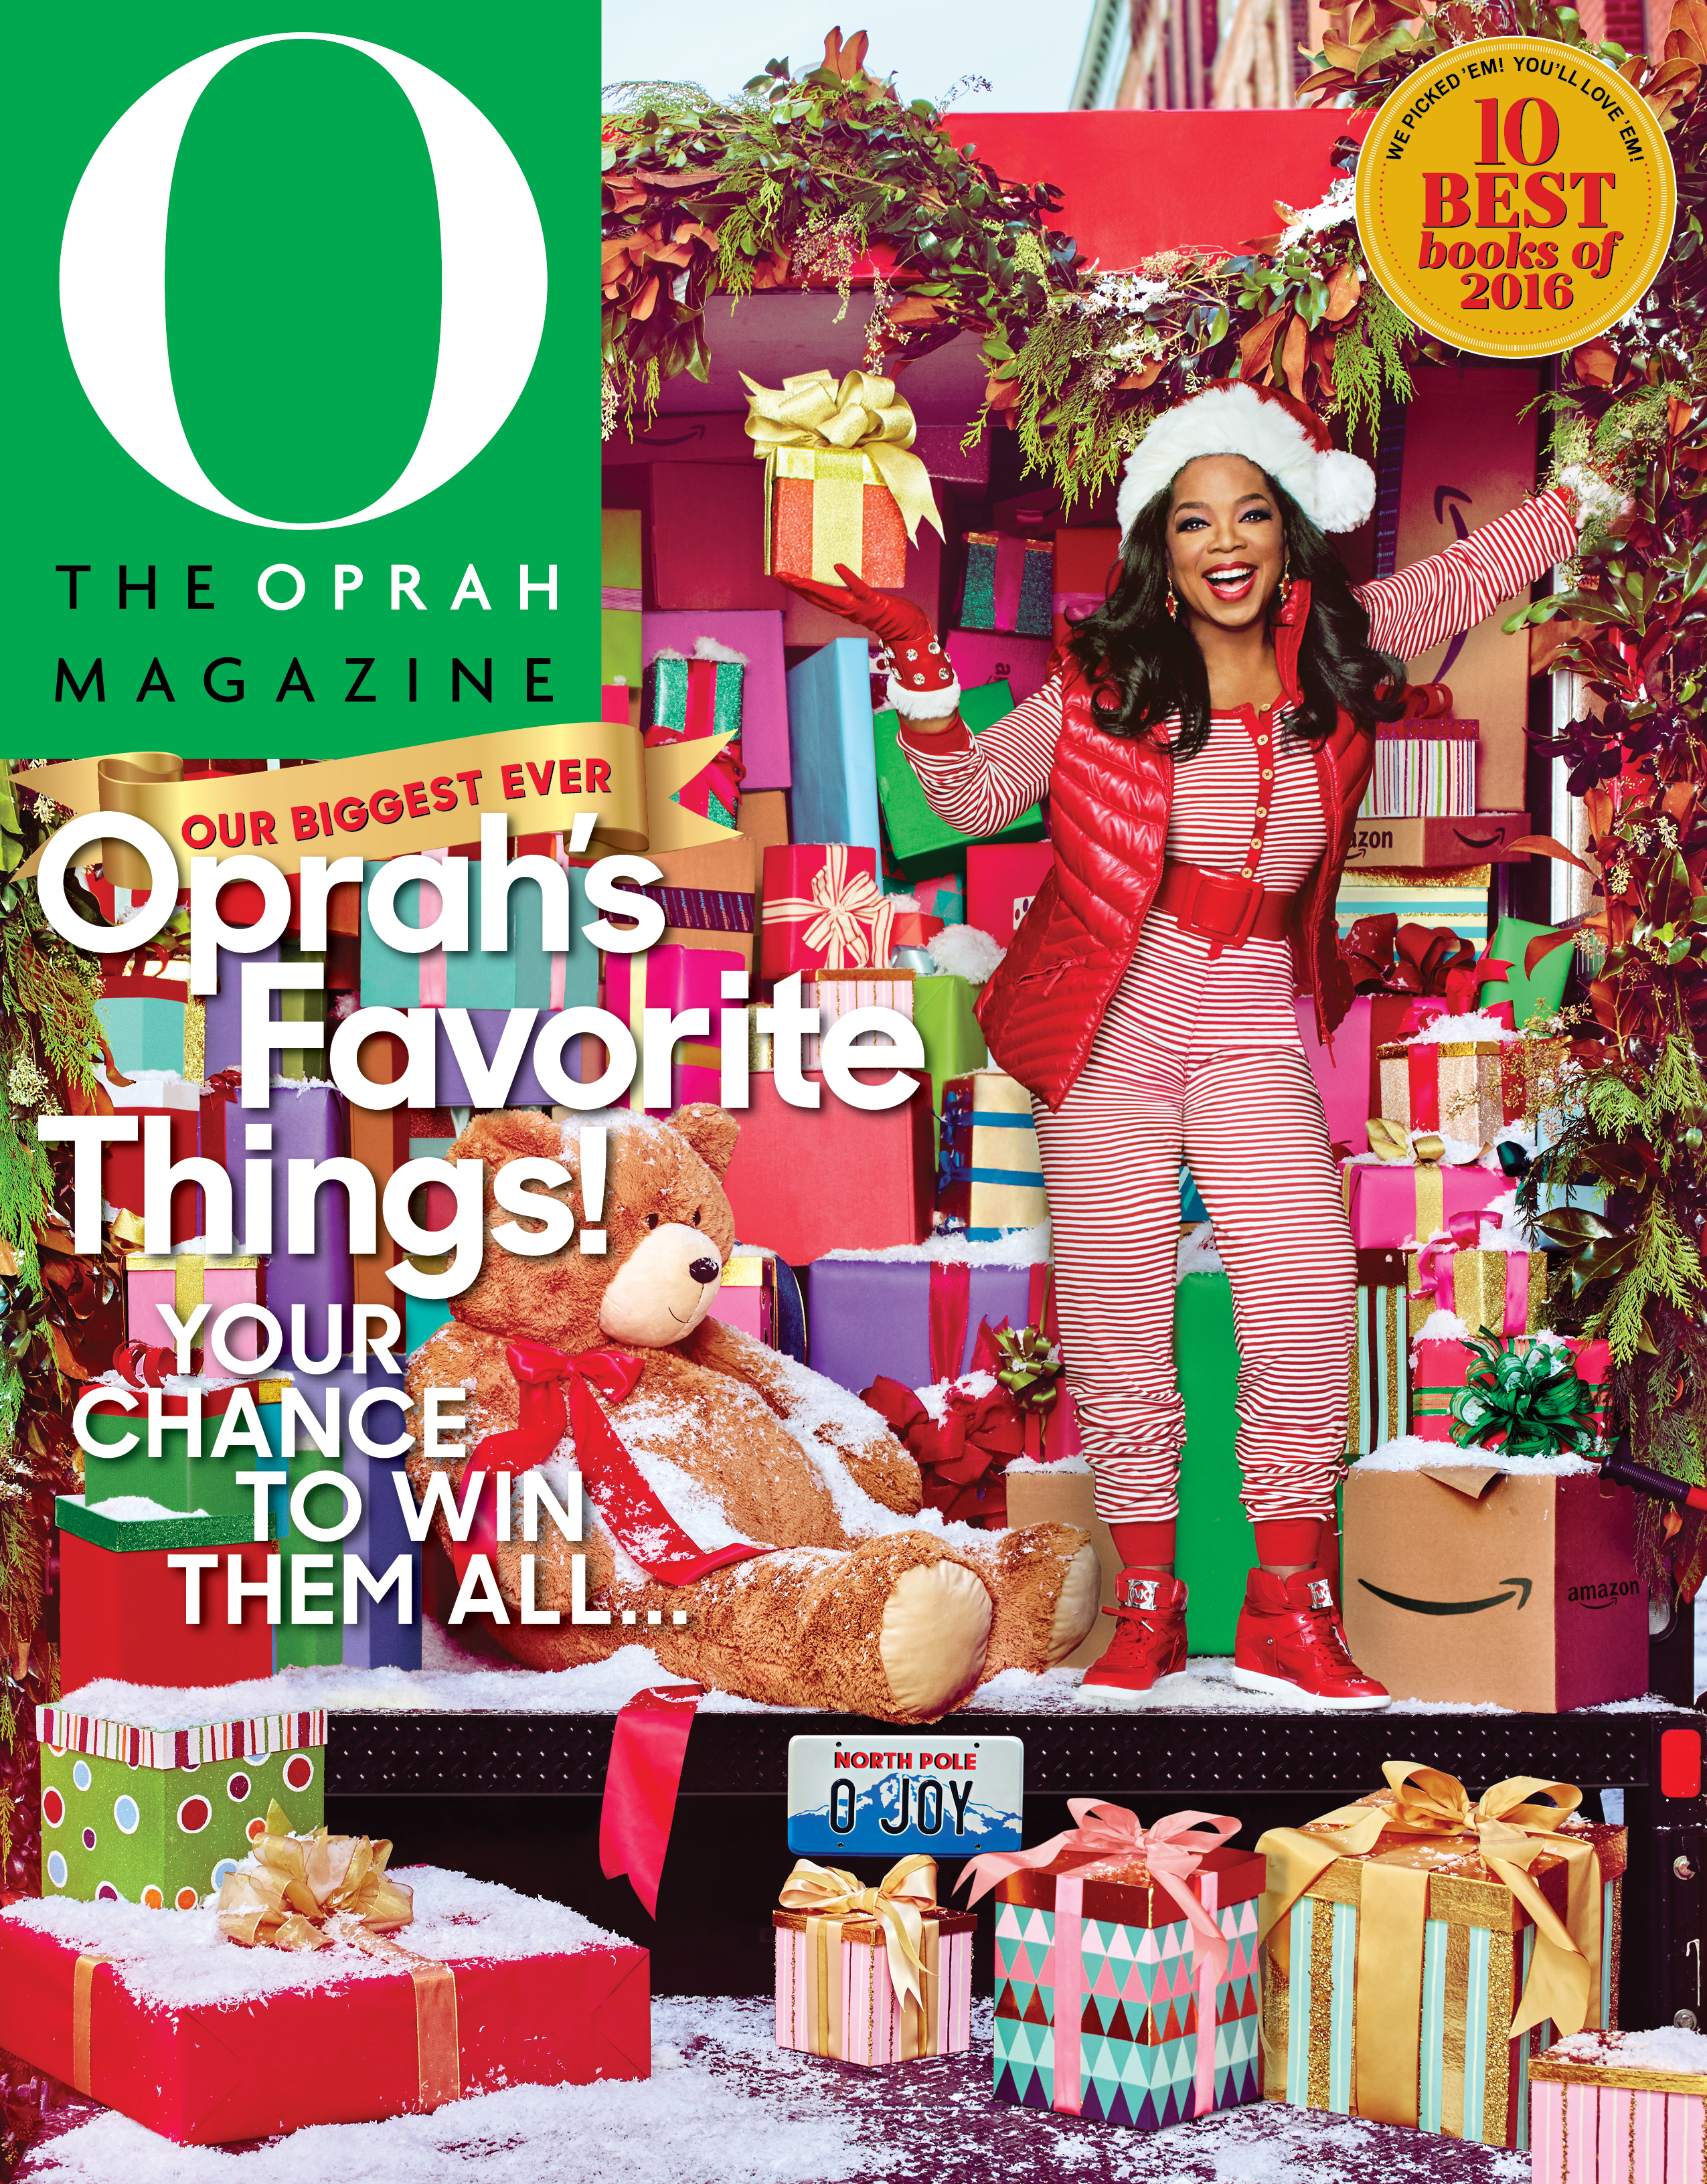 The Oprah 6 - Jams, Preserves & Chutney